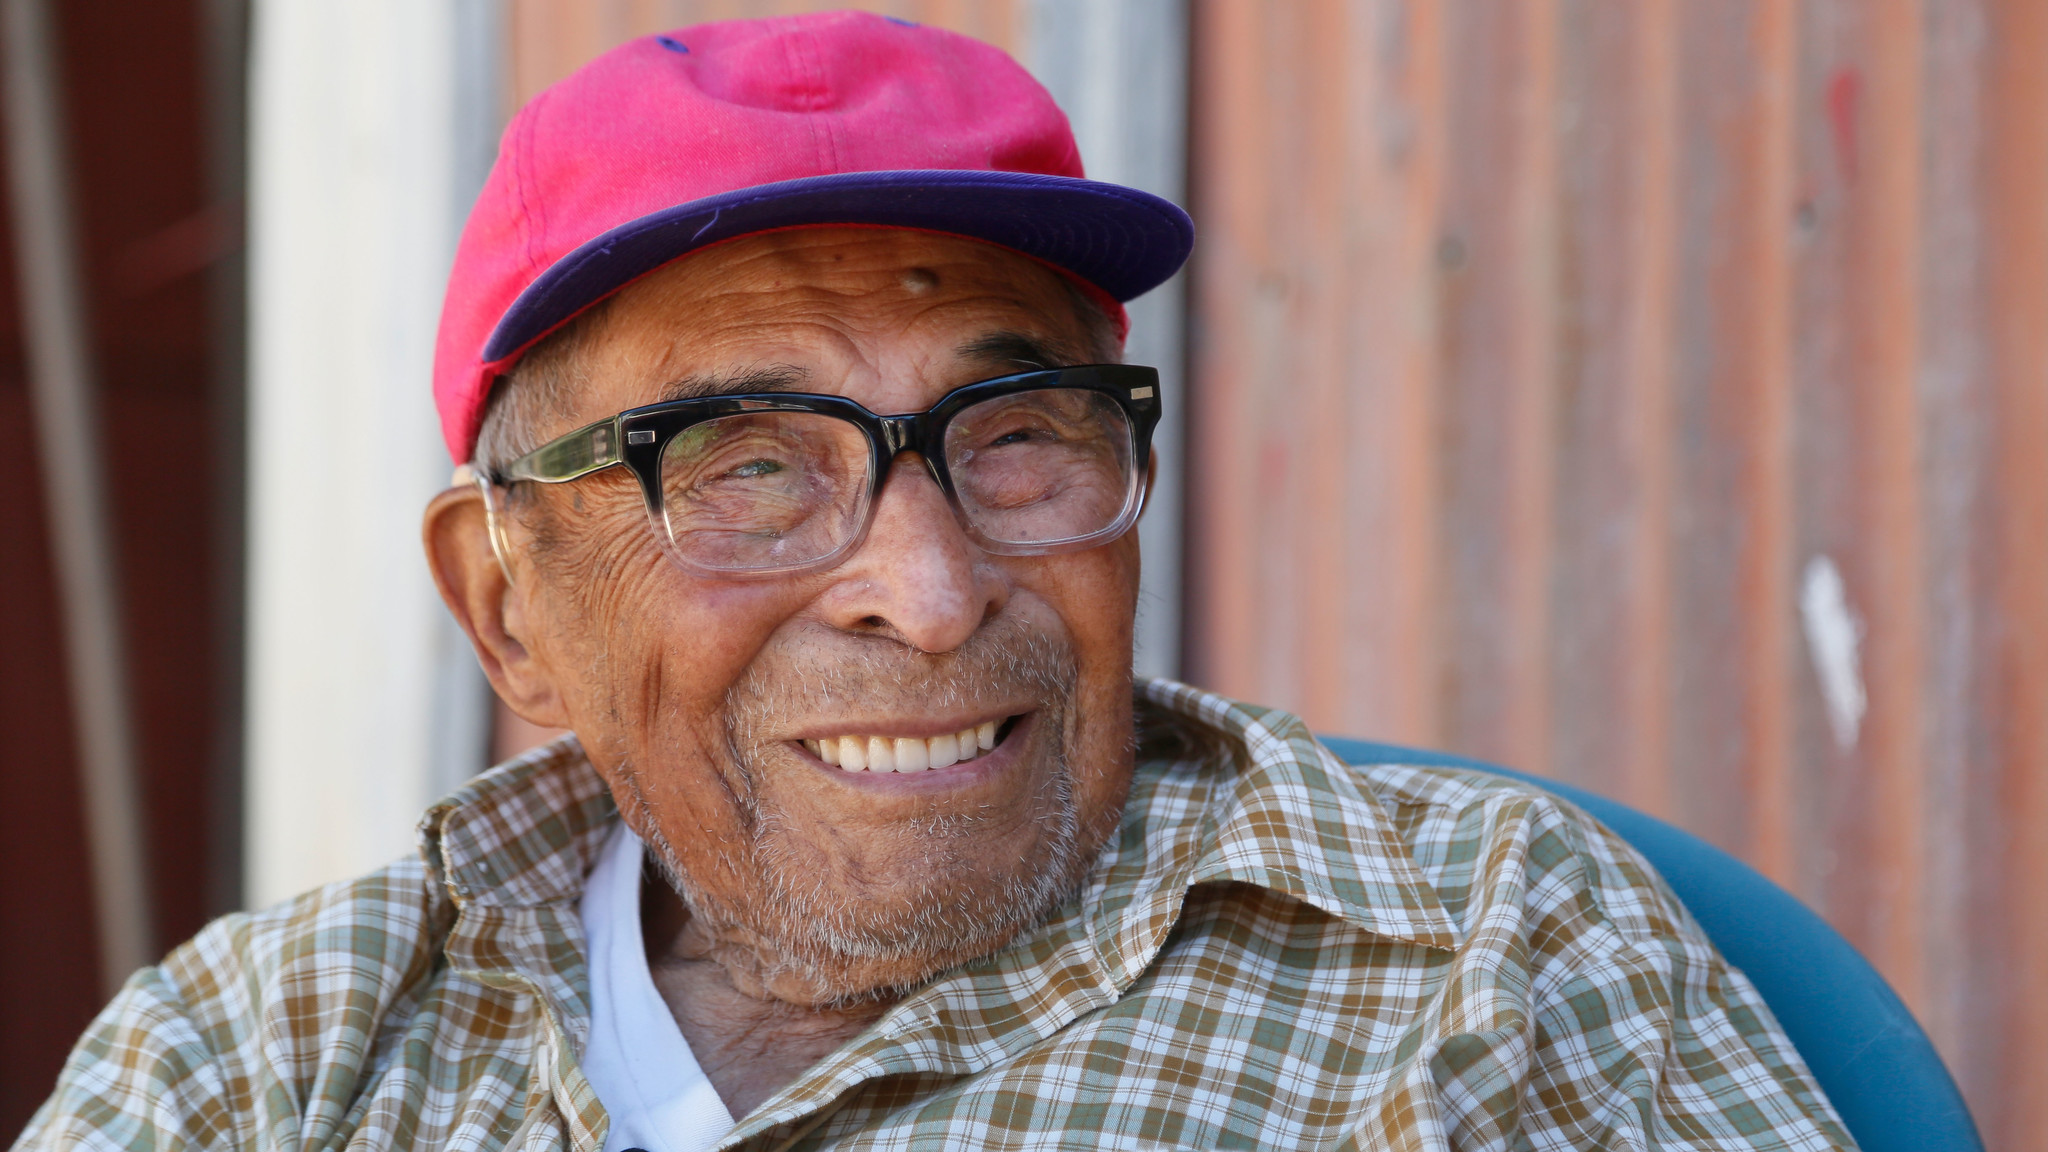 poway u0026 39 s ray chavez  oldest surviving pearl harbor veteran